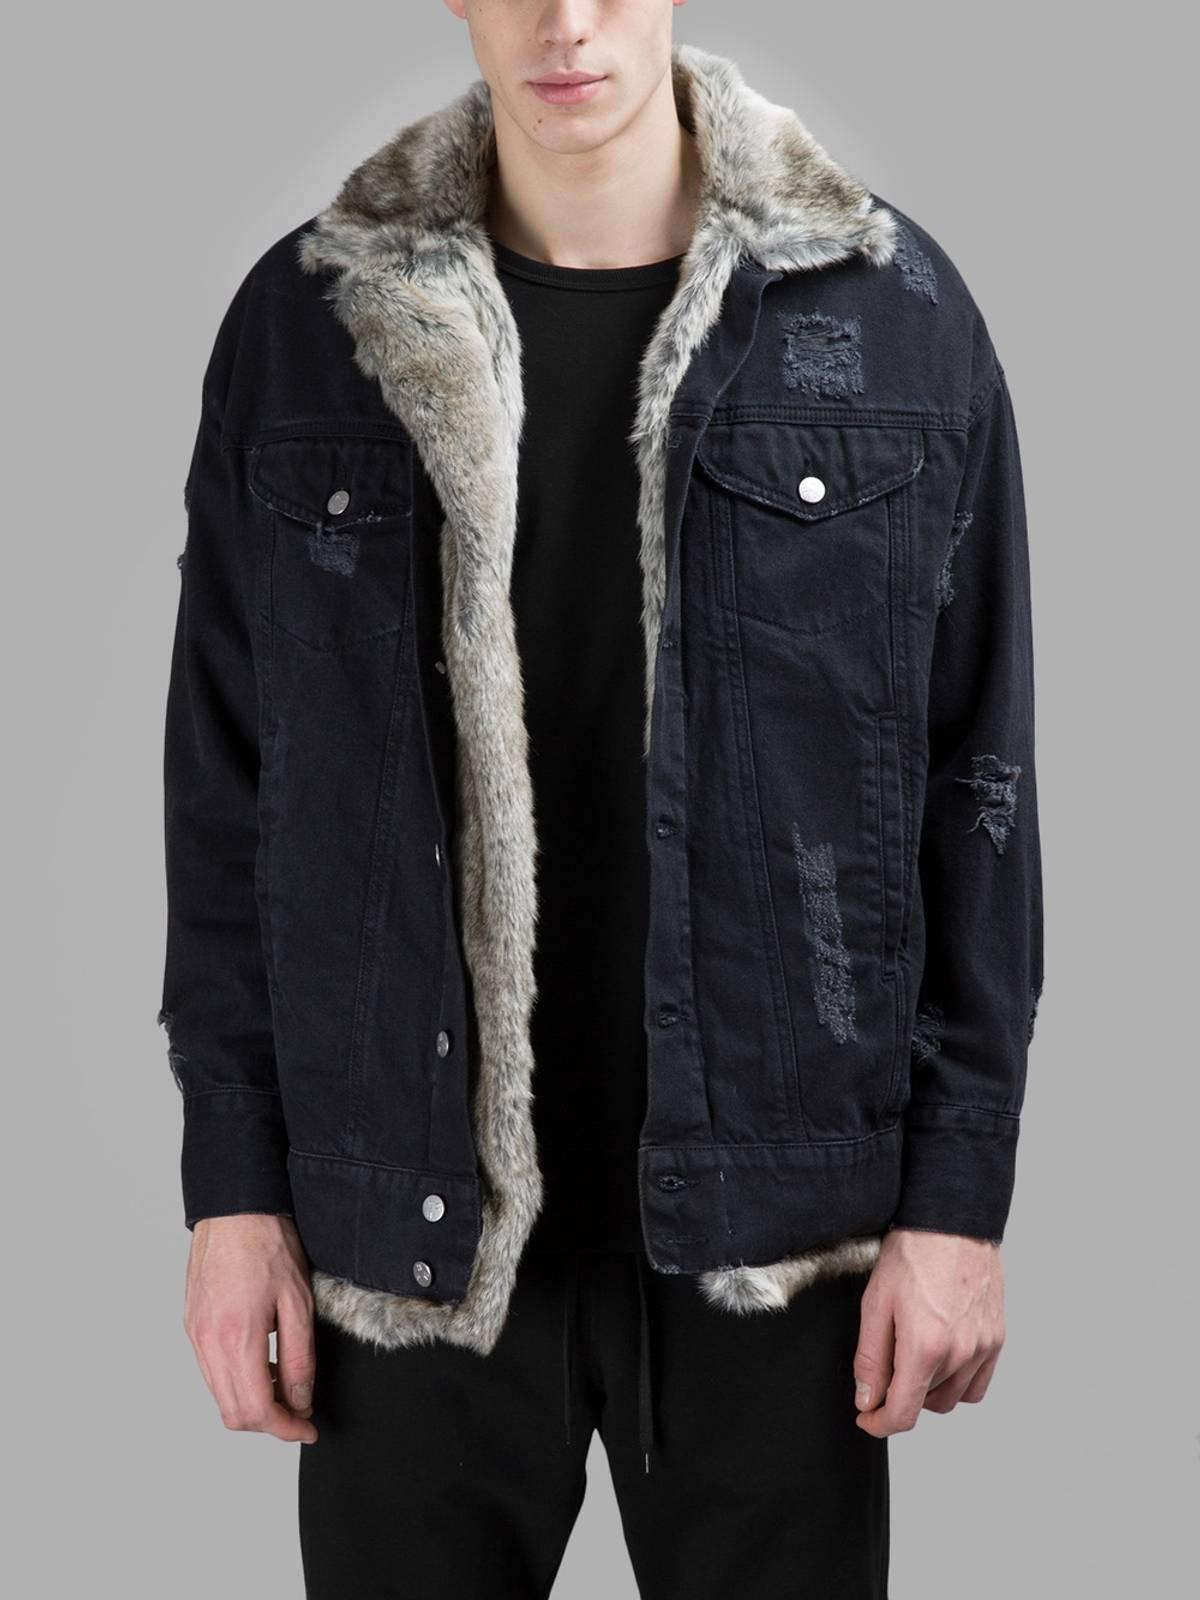 diverse styles professional sale 2019 hot sale Misbhv Misbhv Faux Fur Black Denim Jacket Size S $228